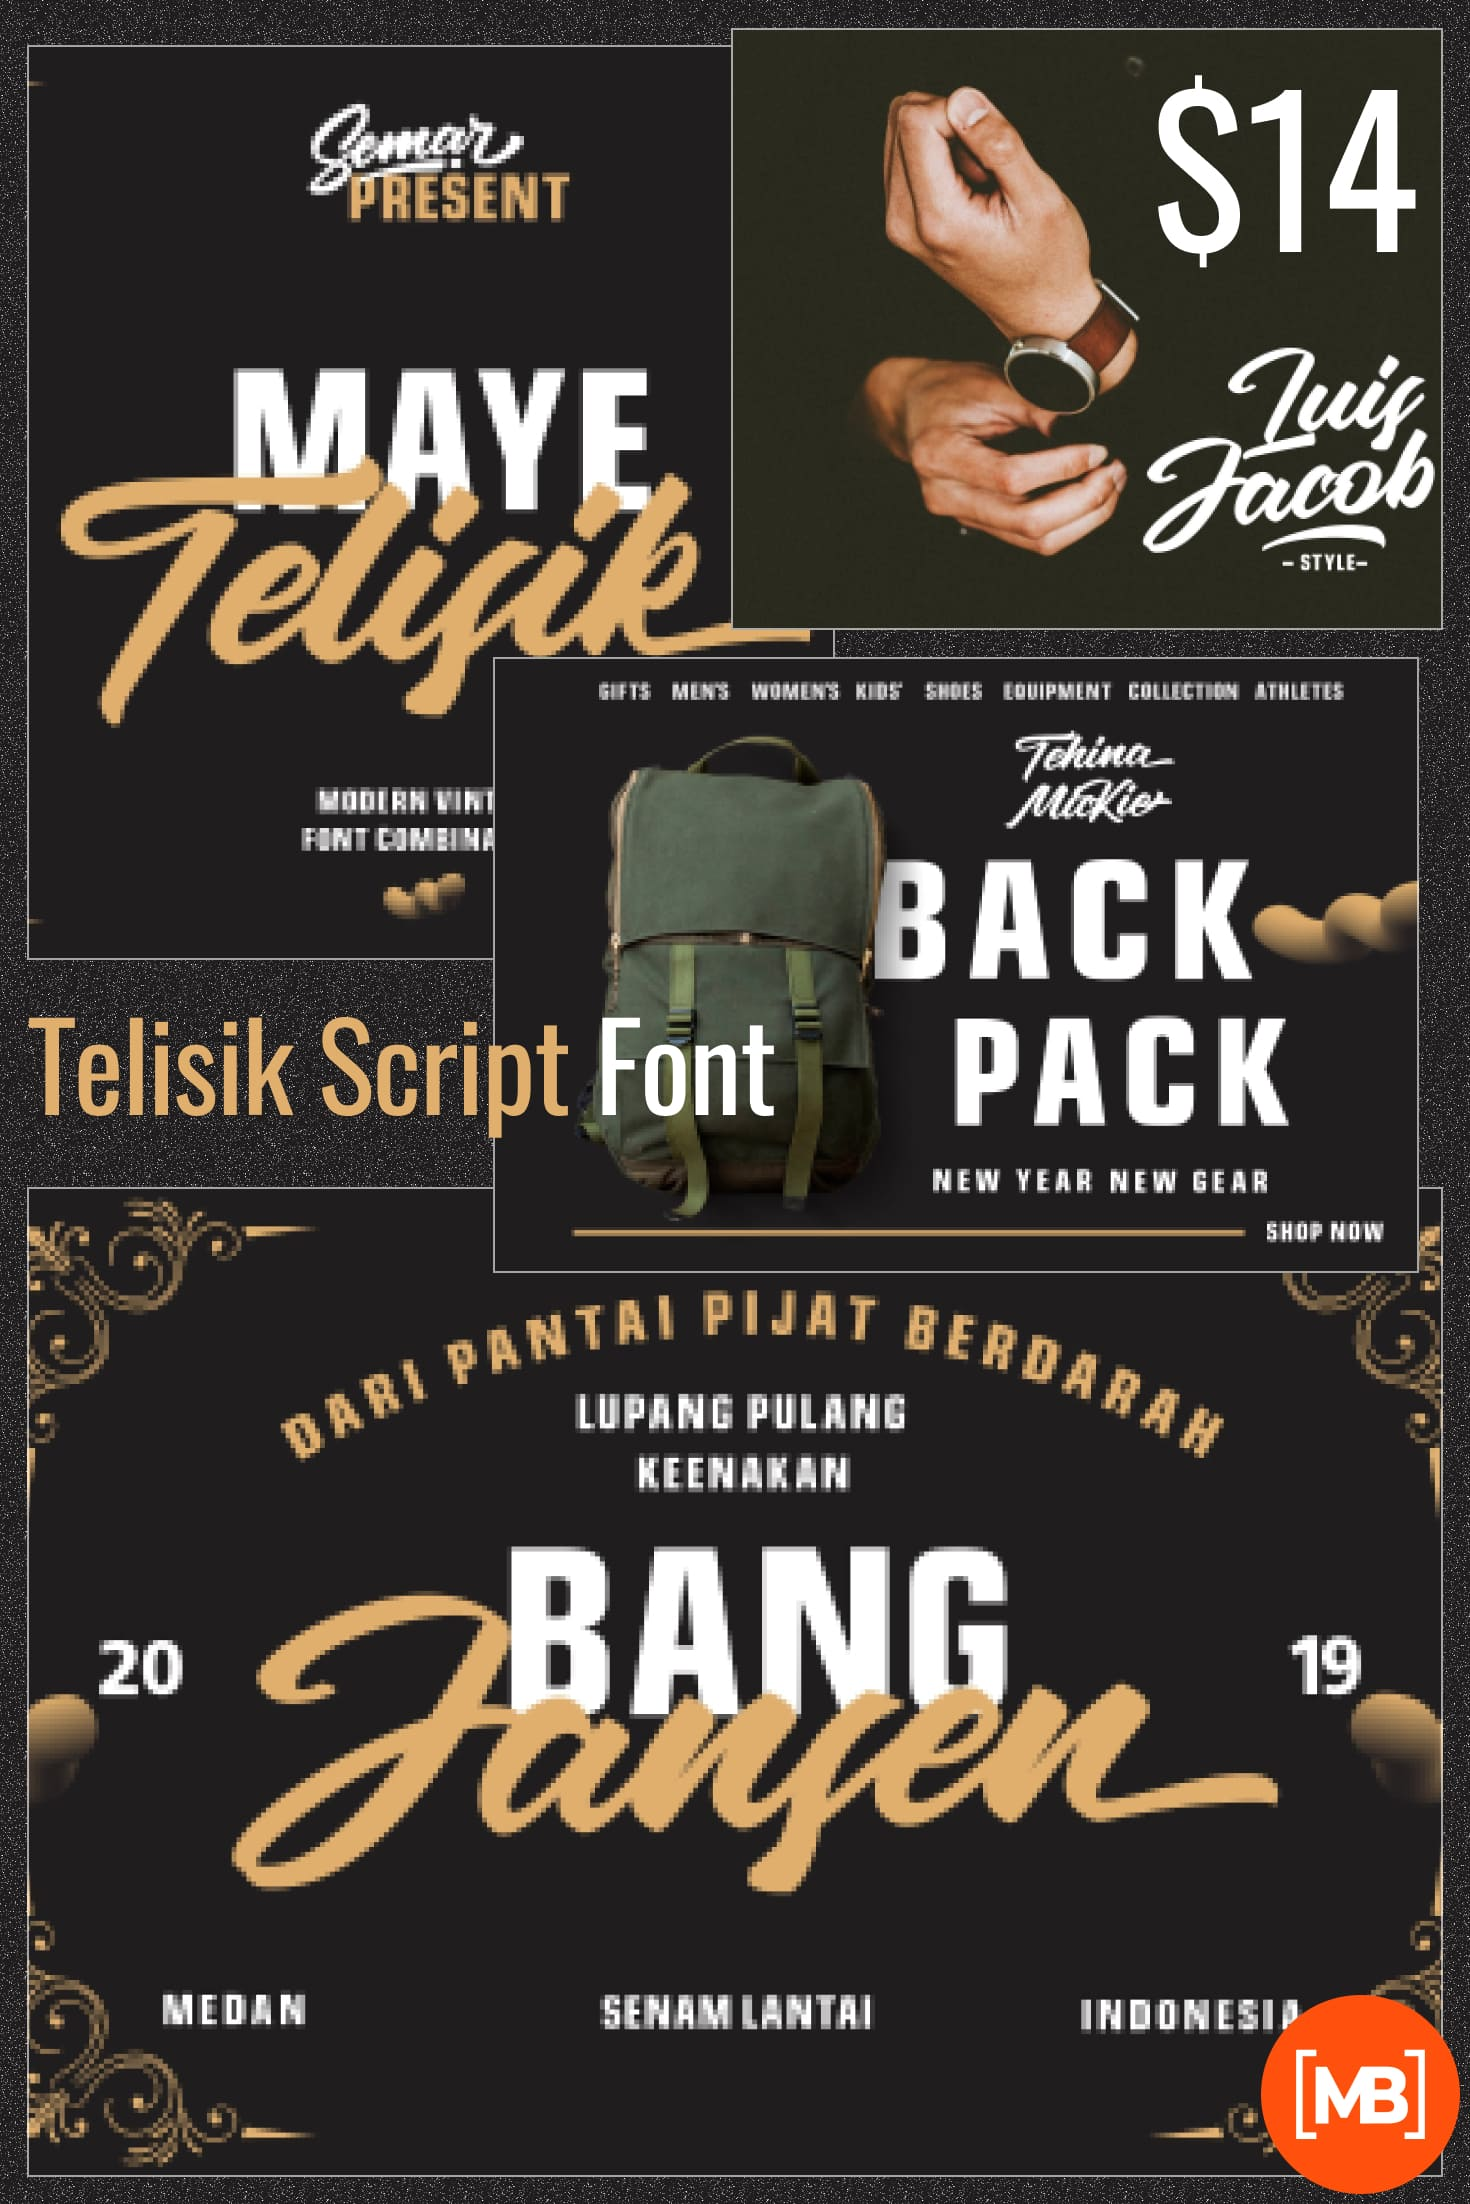 Telisik Script Font - $14.Collage Image.